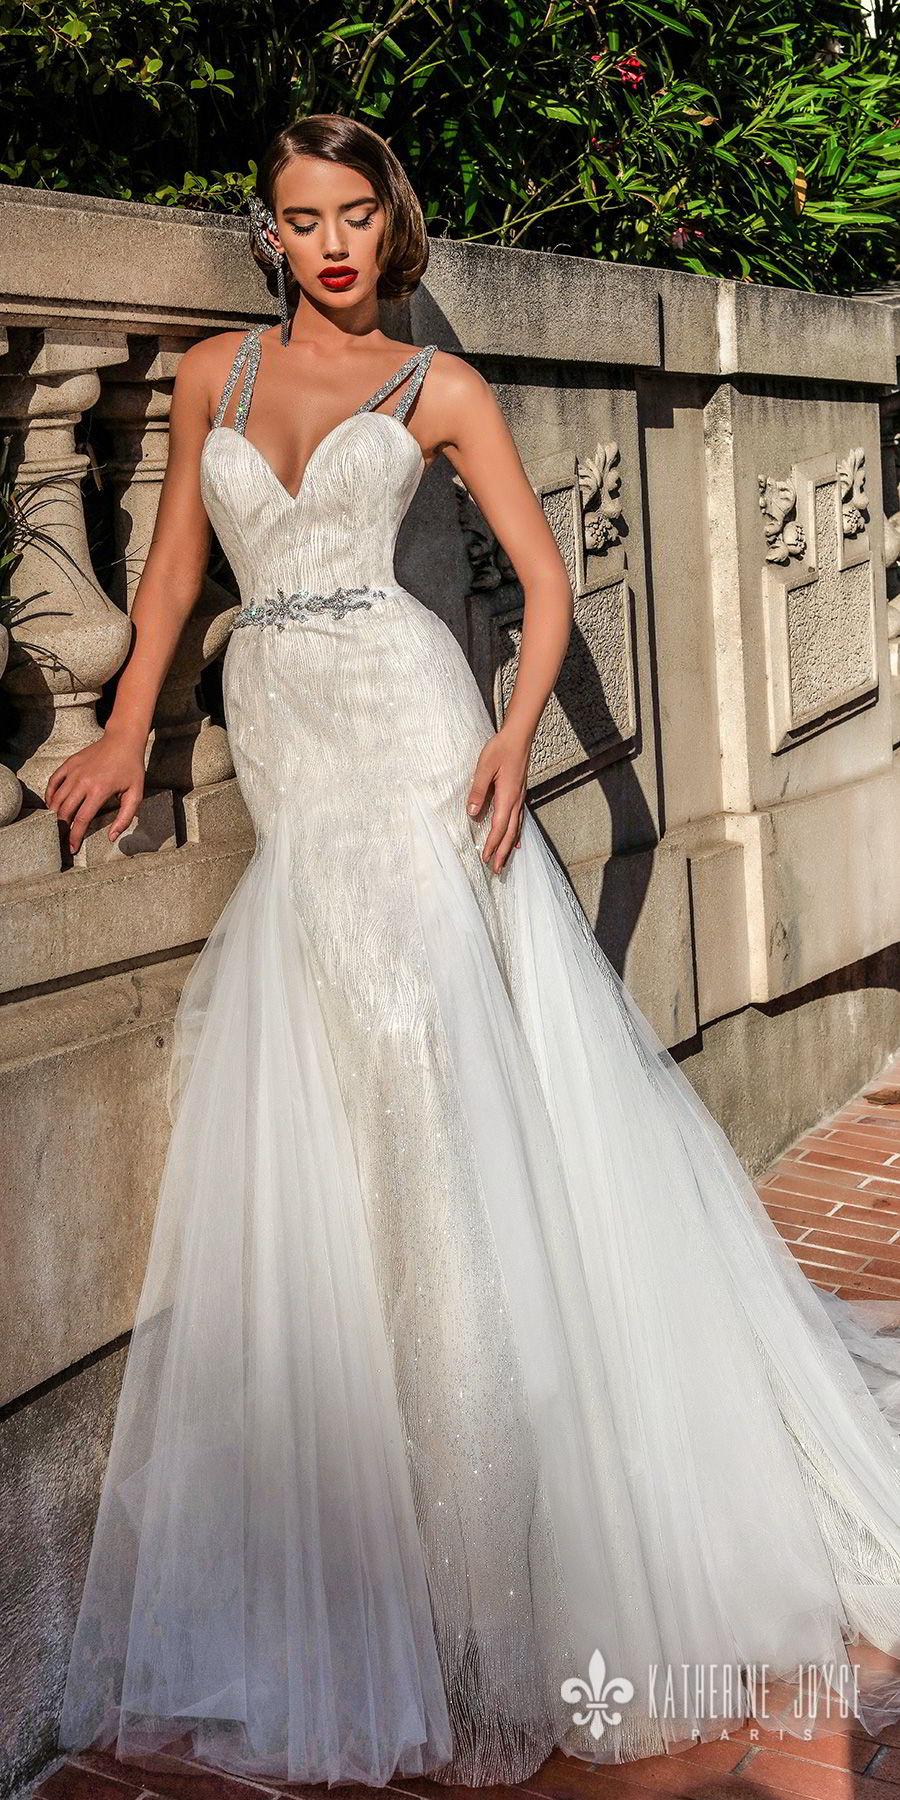 katherine joyce 2018 bridal double strap sweetheart neckline full embellishment elegant a  line wedding dress cross trap back chapel train (rebeca) mv